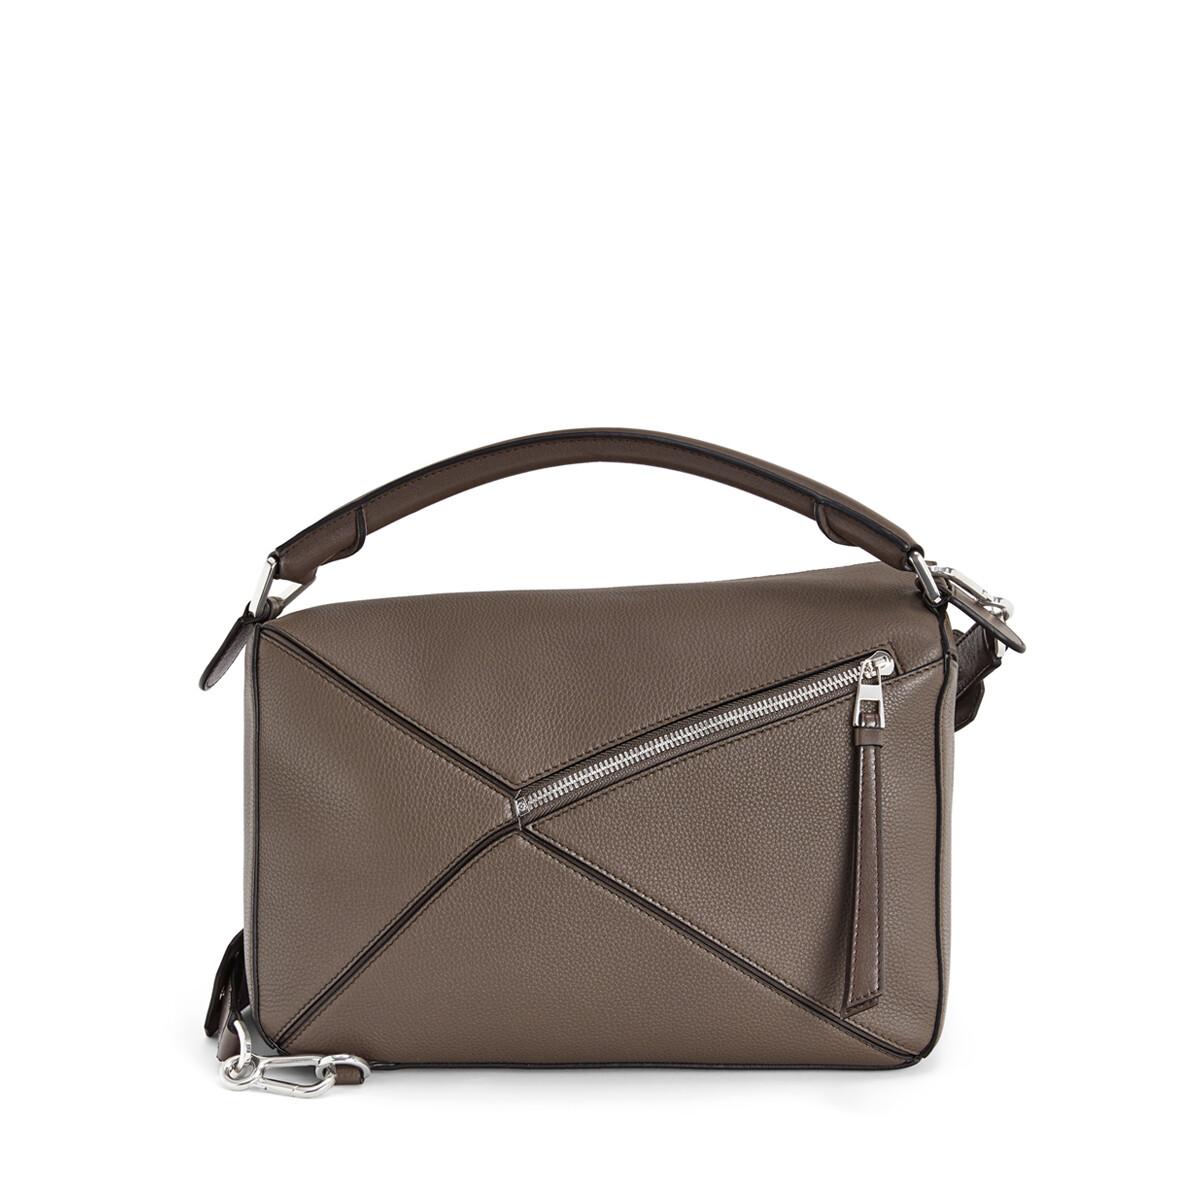 LOEWE Puzzle Bag Dark Taupe front